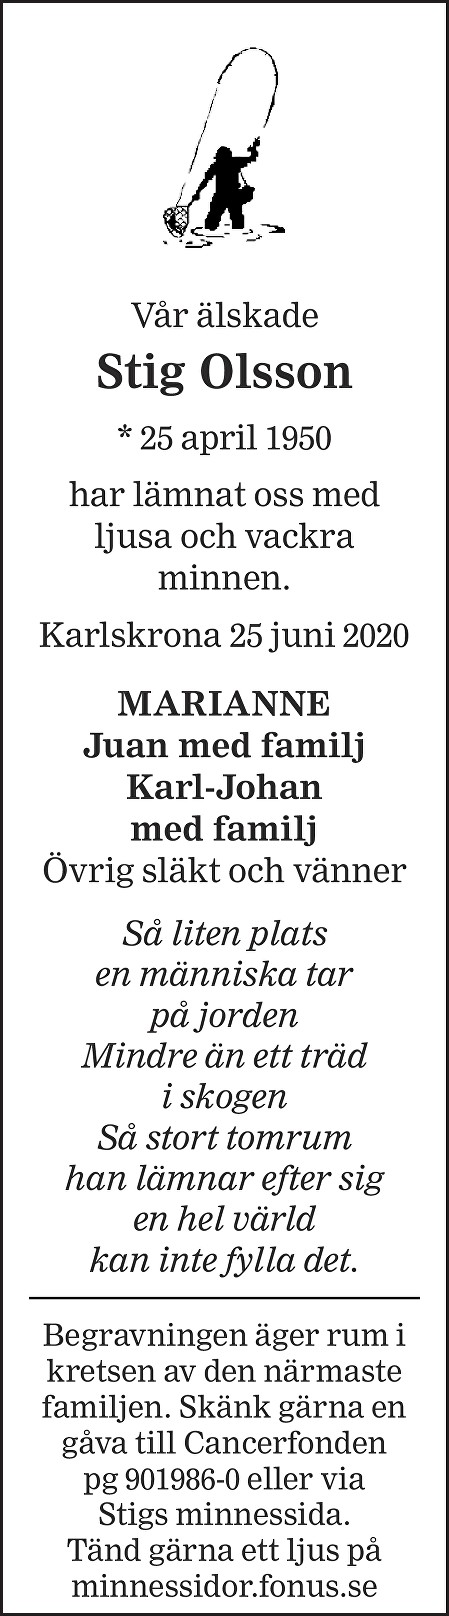 Stig Olsson Death notice